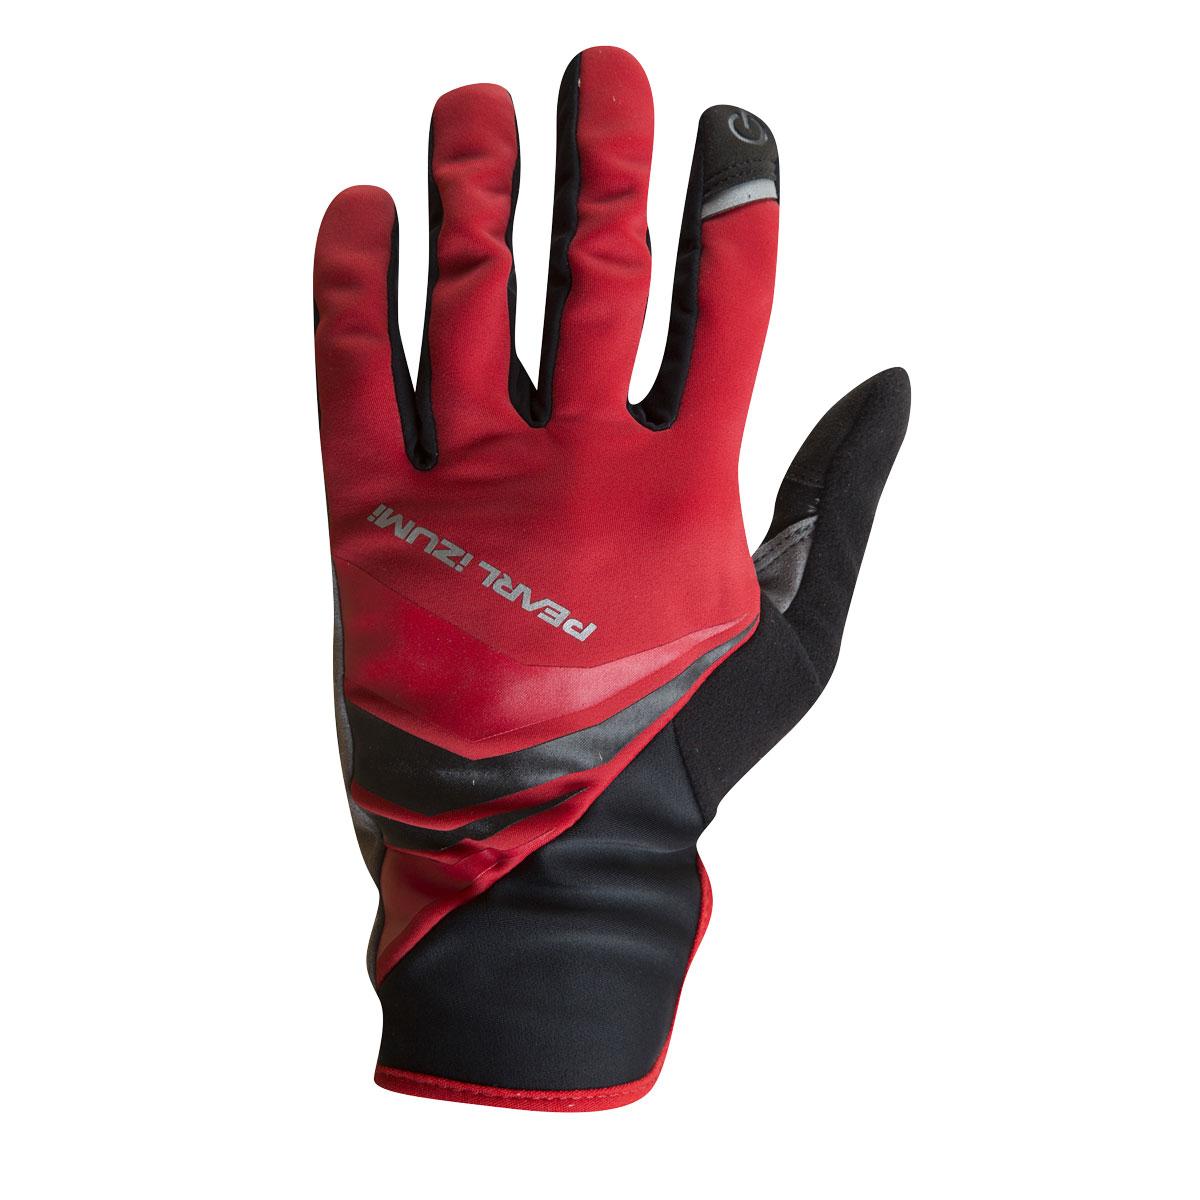 PEARL iZUMi CYCLONE GEL rukavice, TRUE červená, L